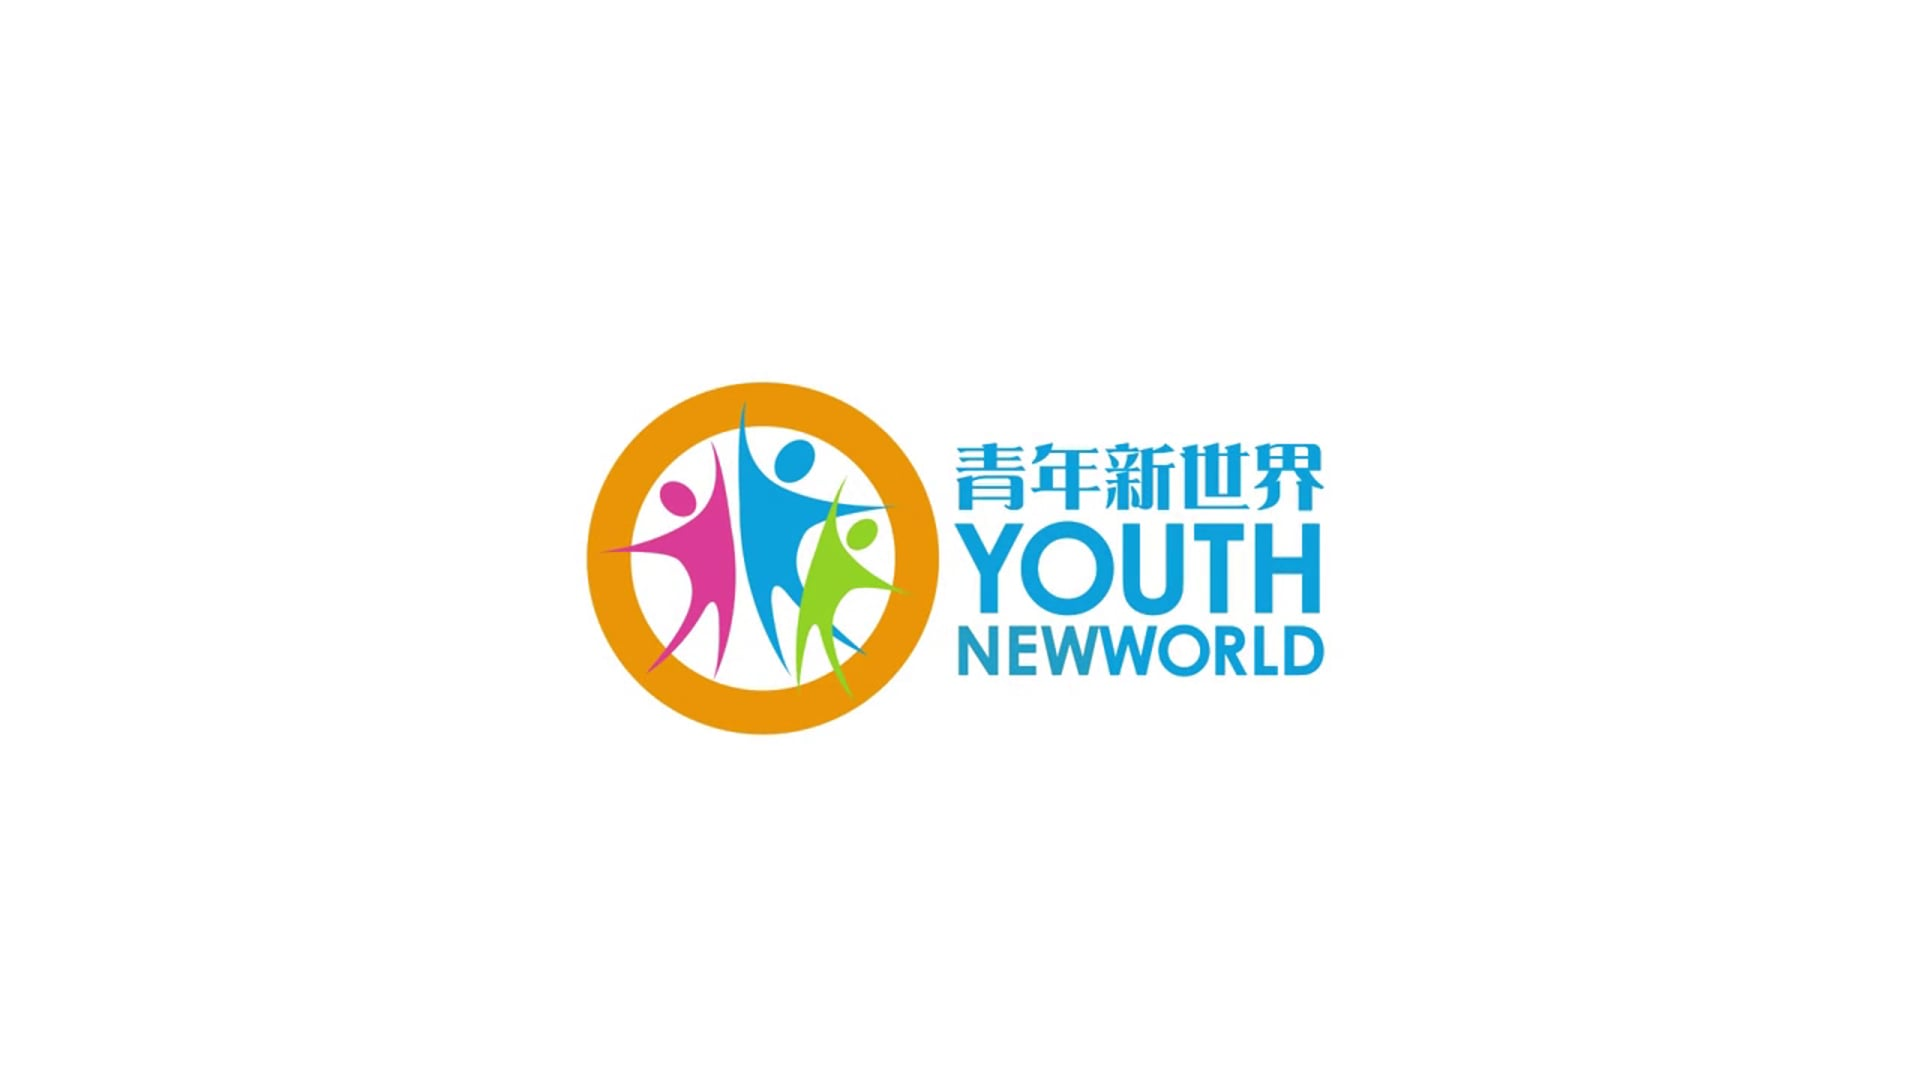 Youth New World 青年新世界